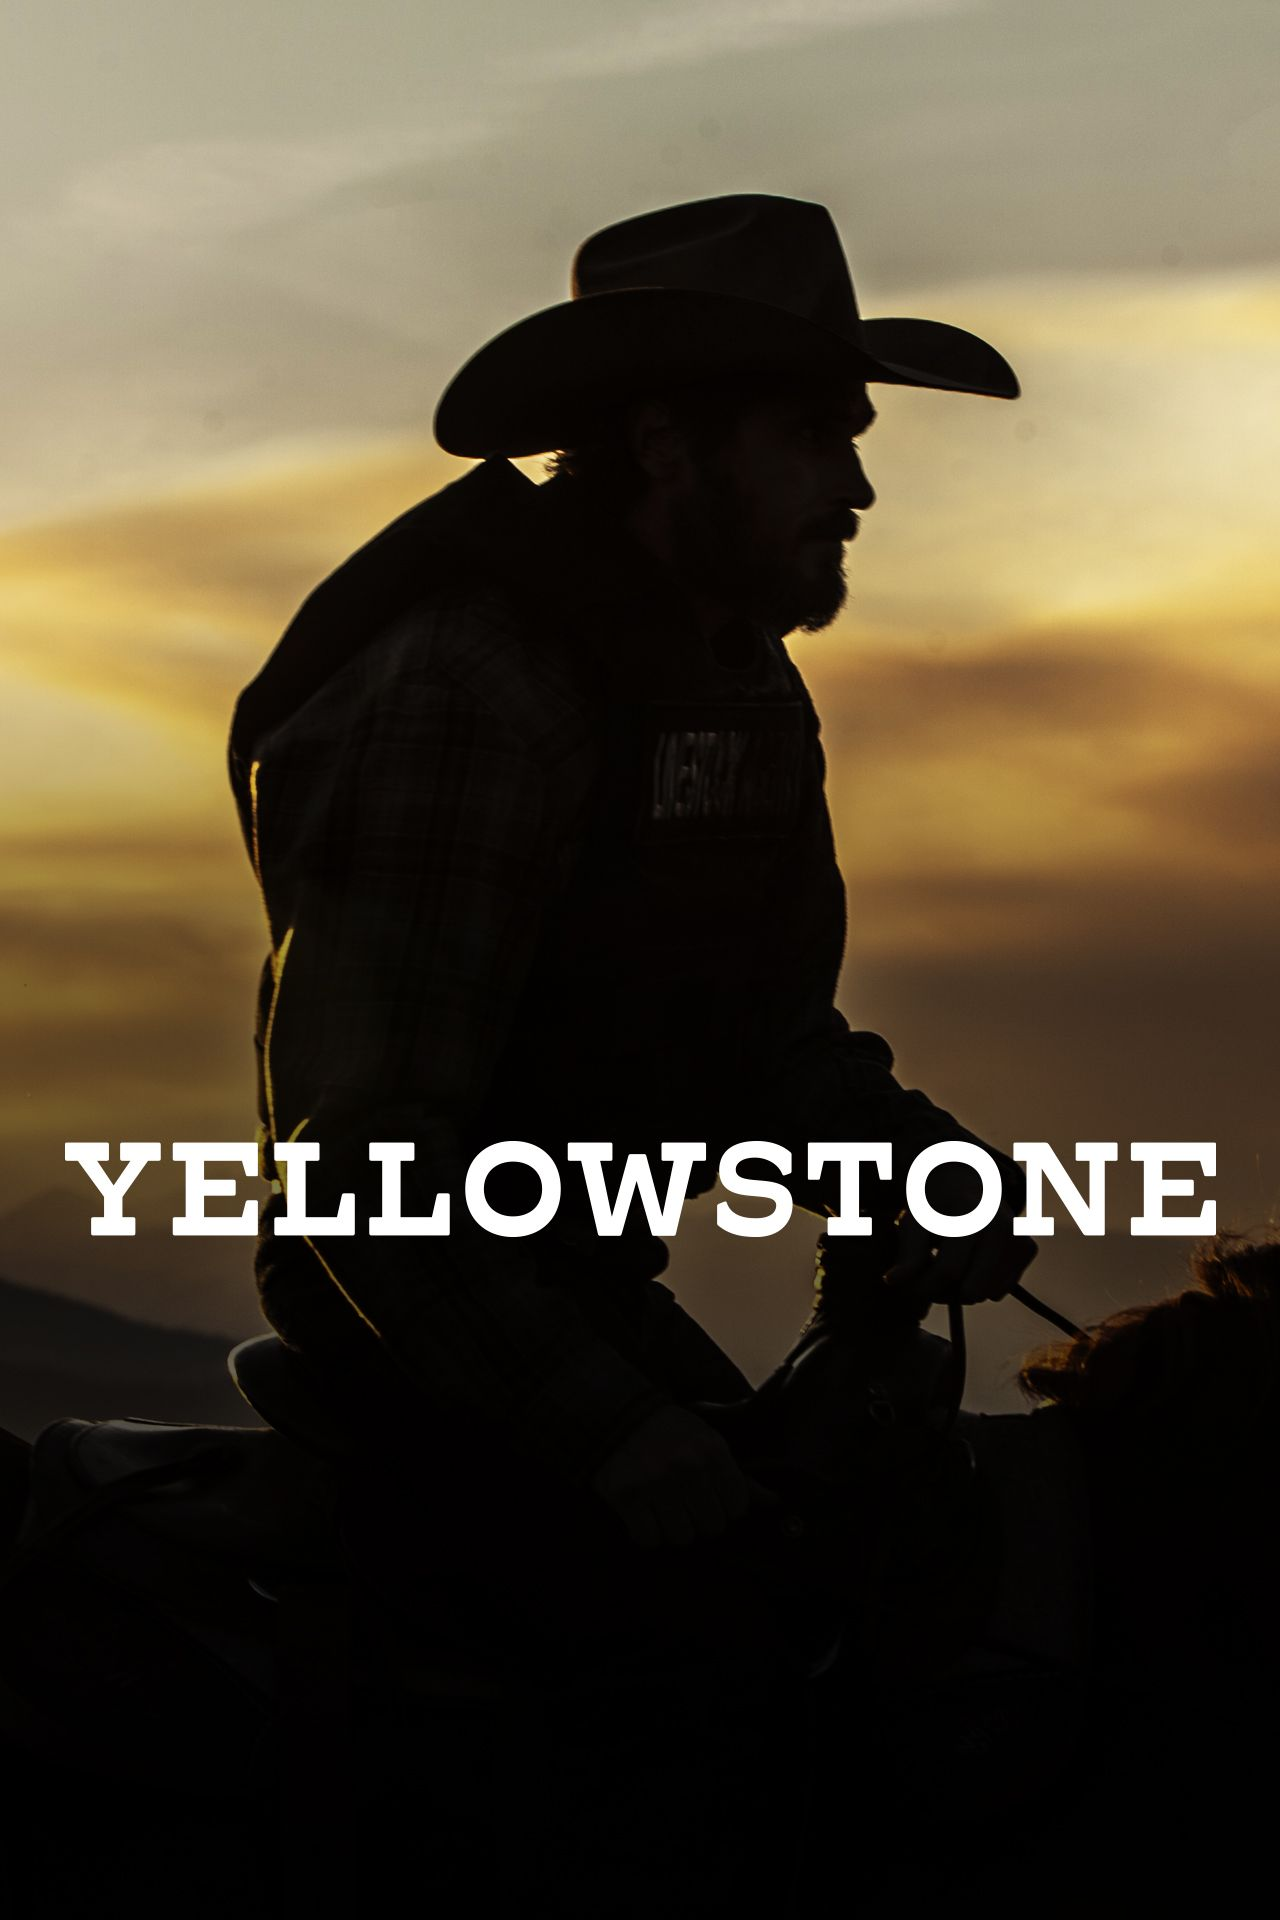 Yellowstone - Taylor Sheridan